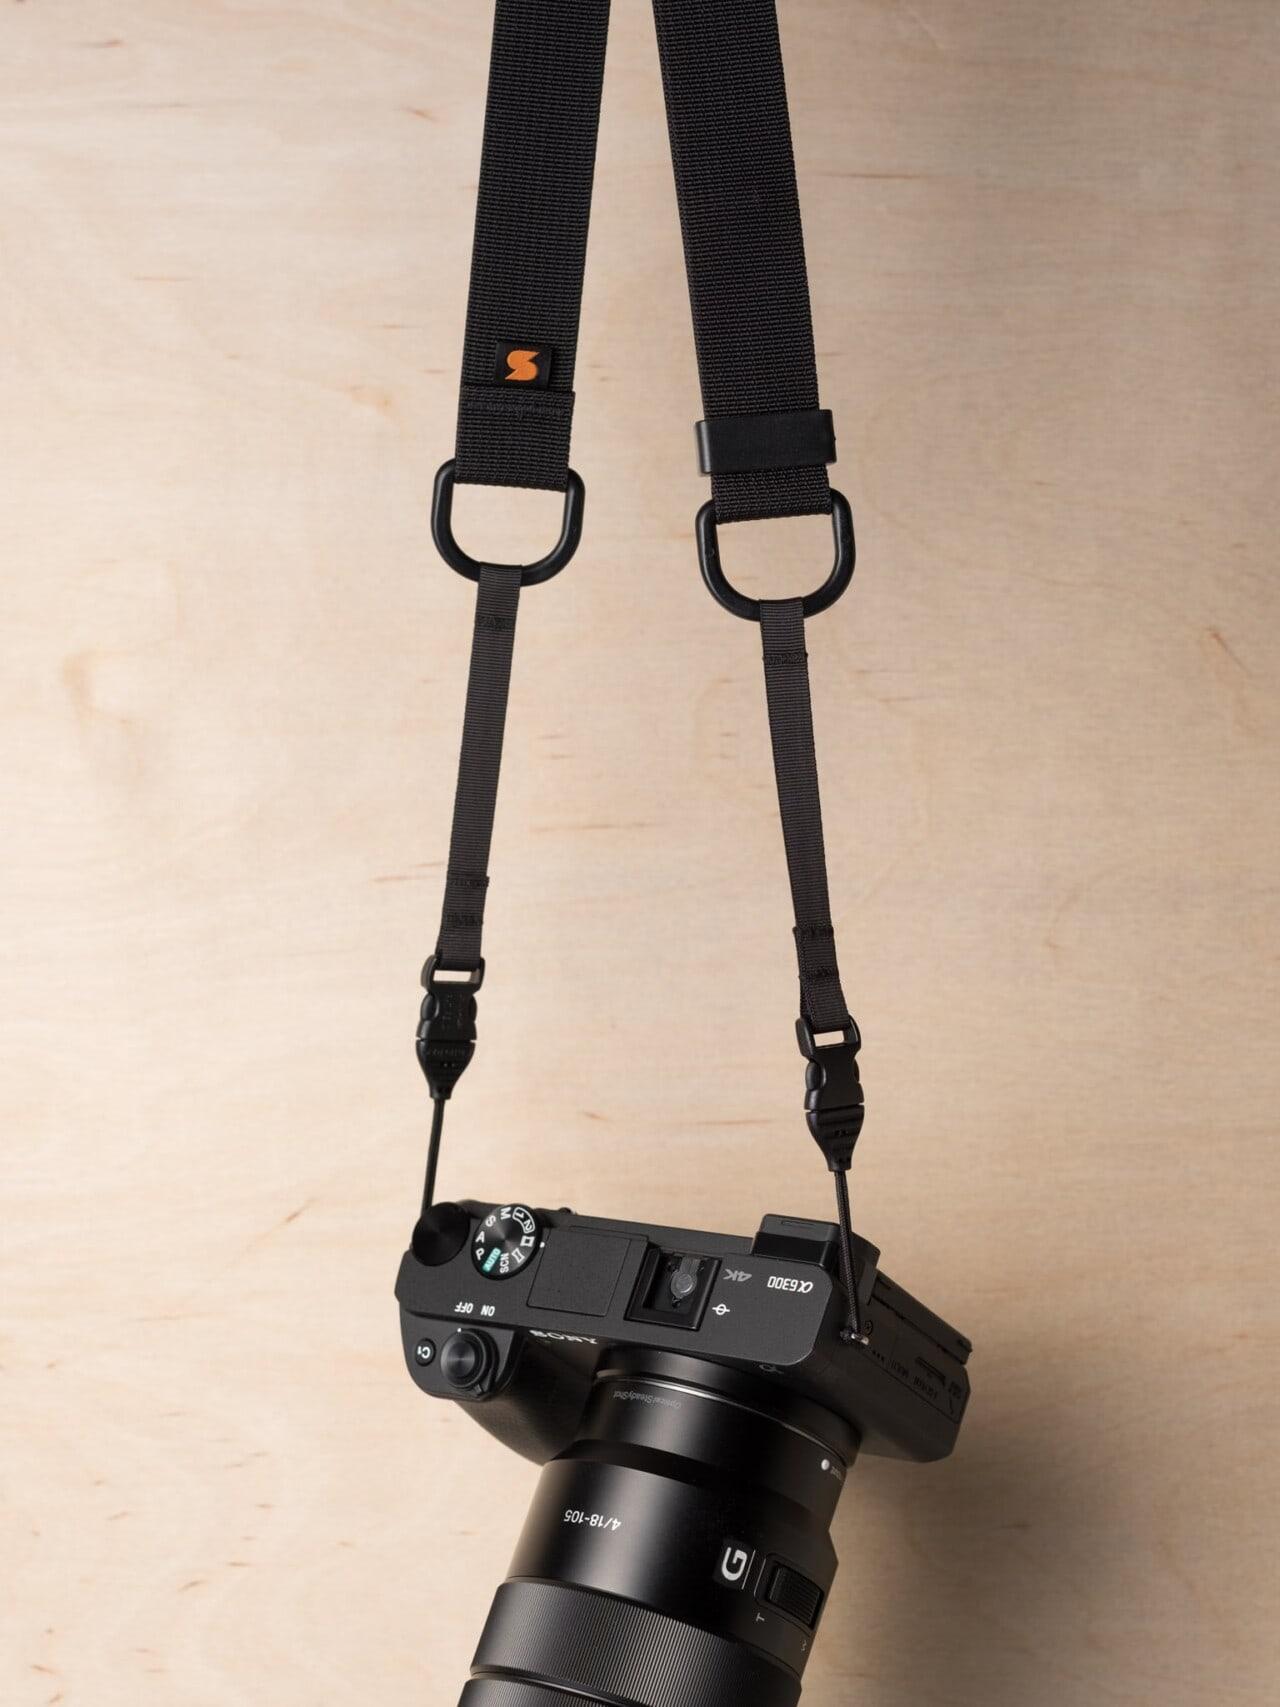 Simplr M1a Mirrorless Camera Strap on Sony Alpha a6300